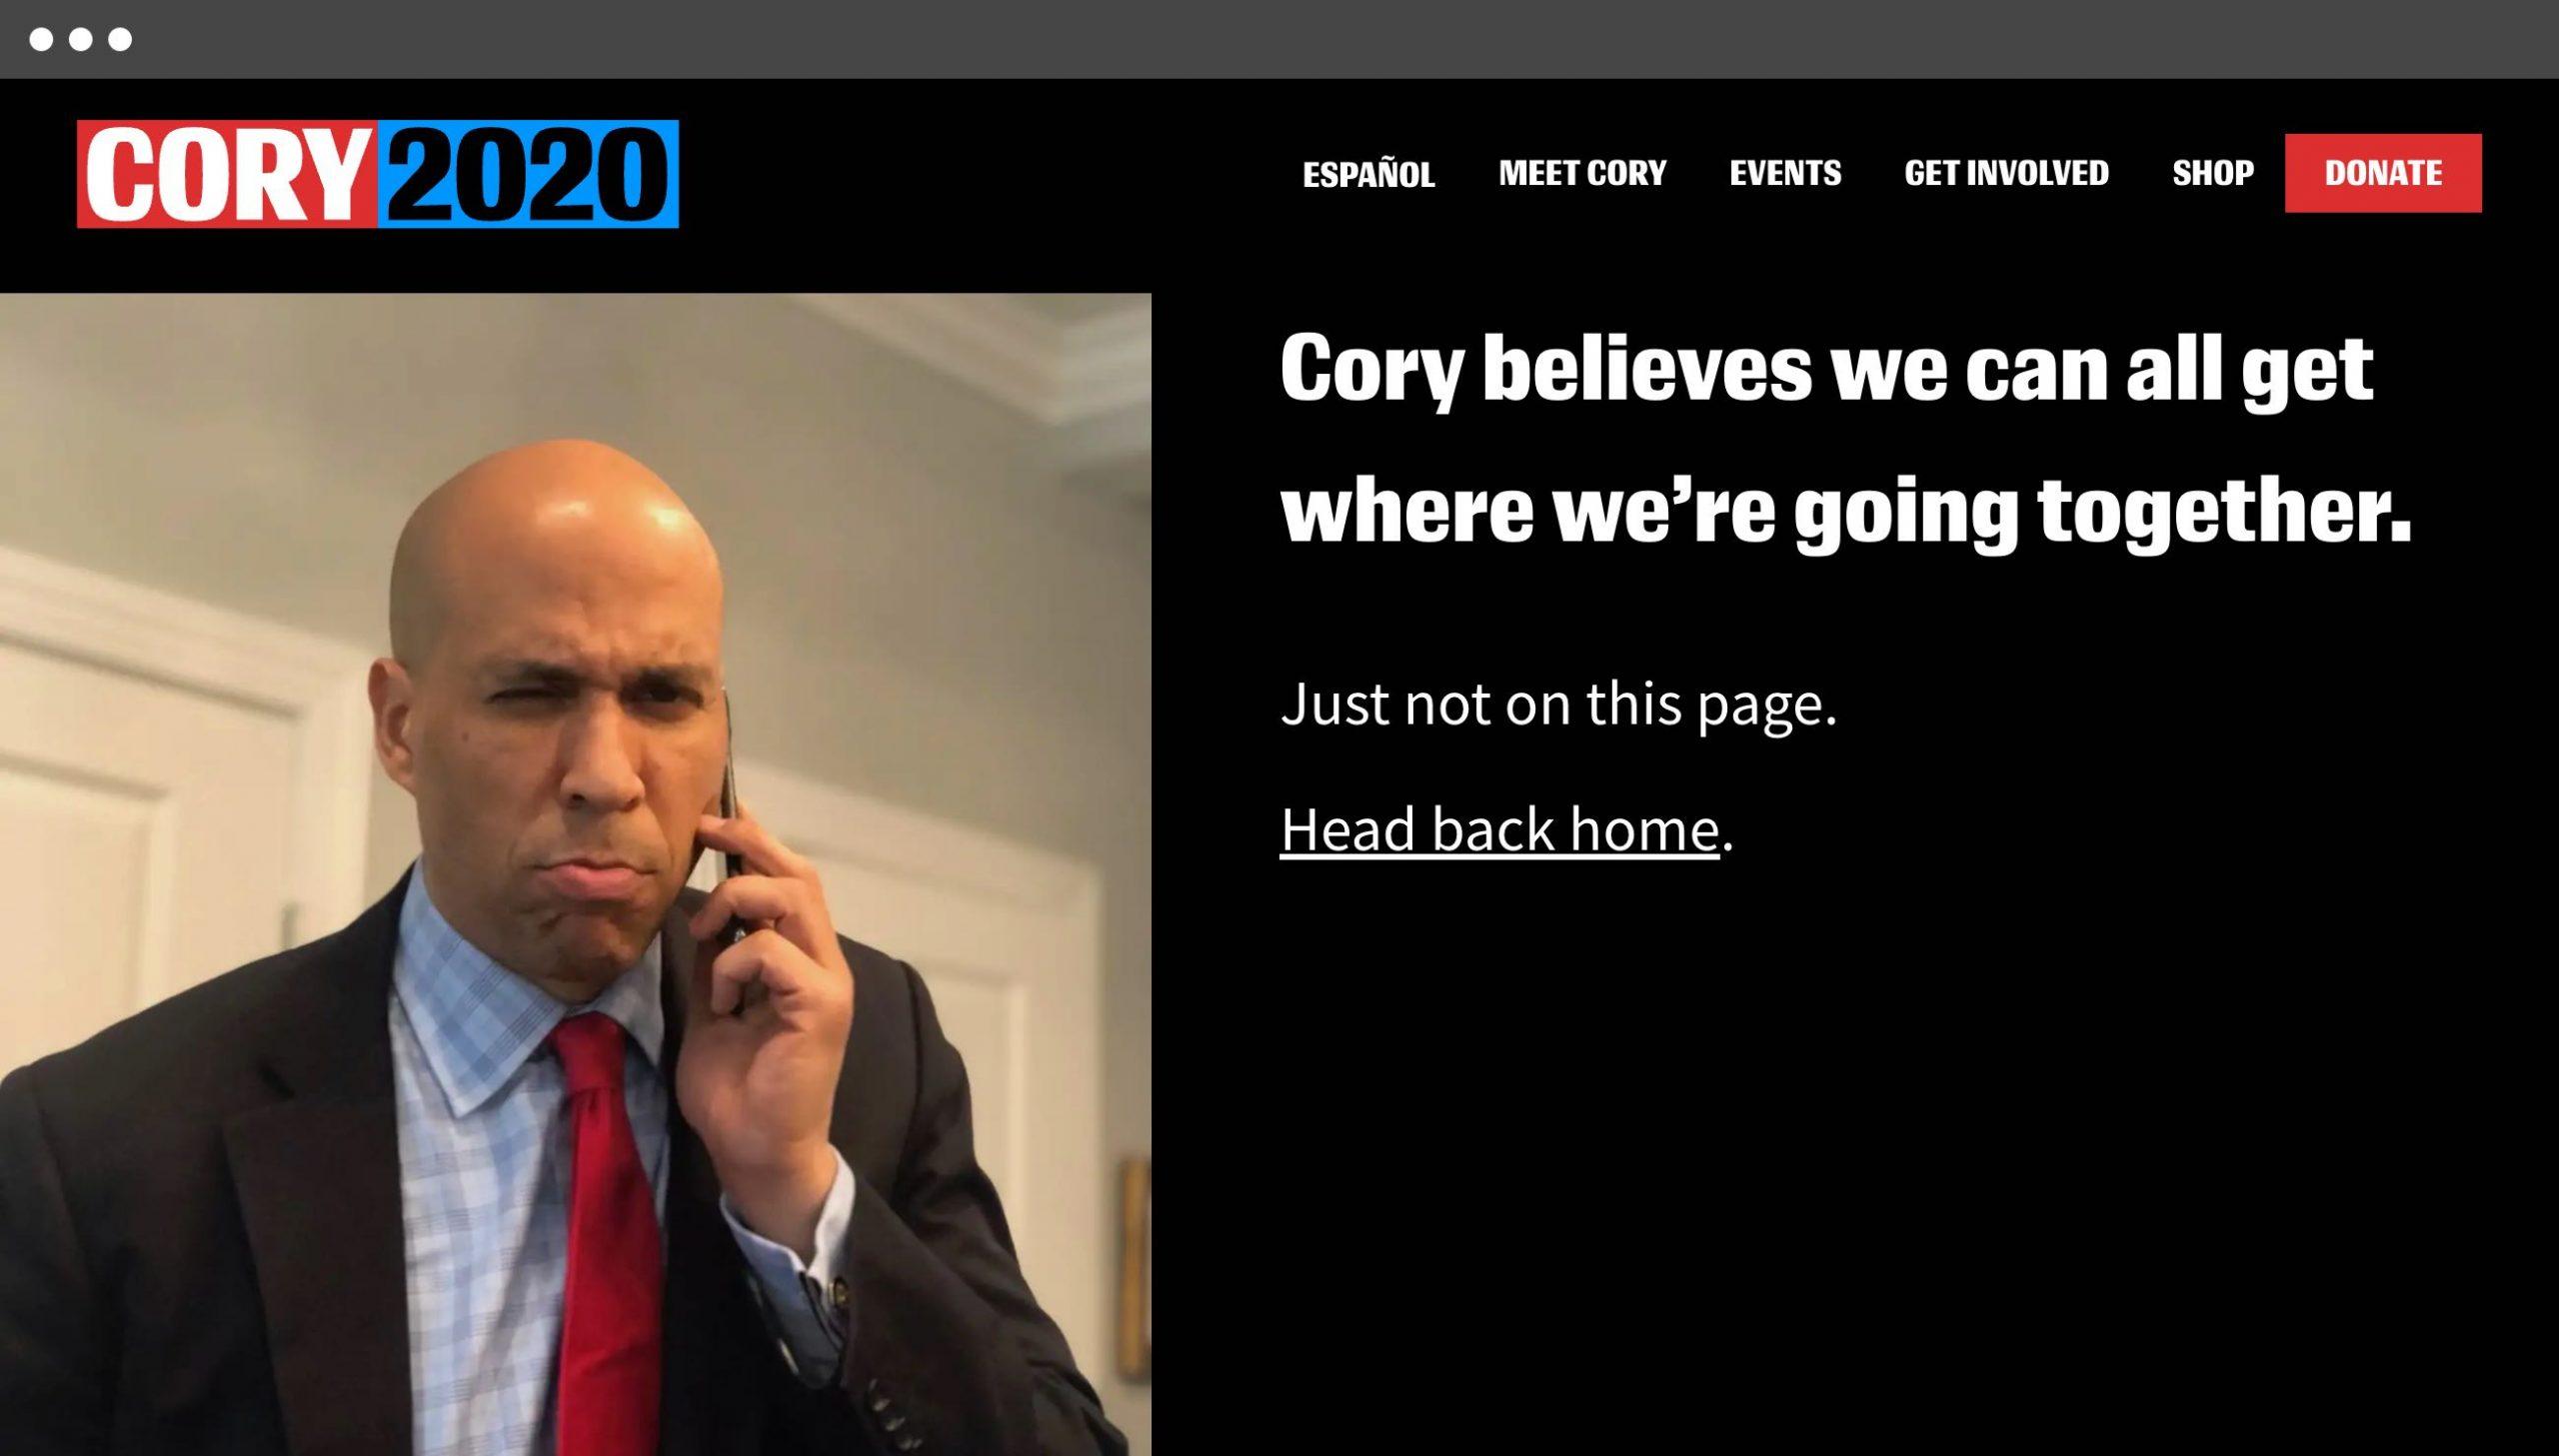 Cory Booker 404 page